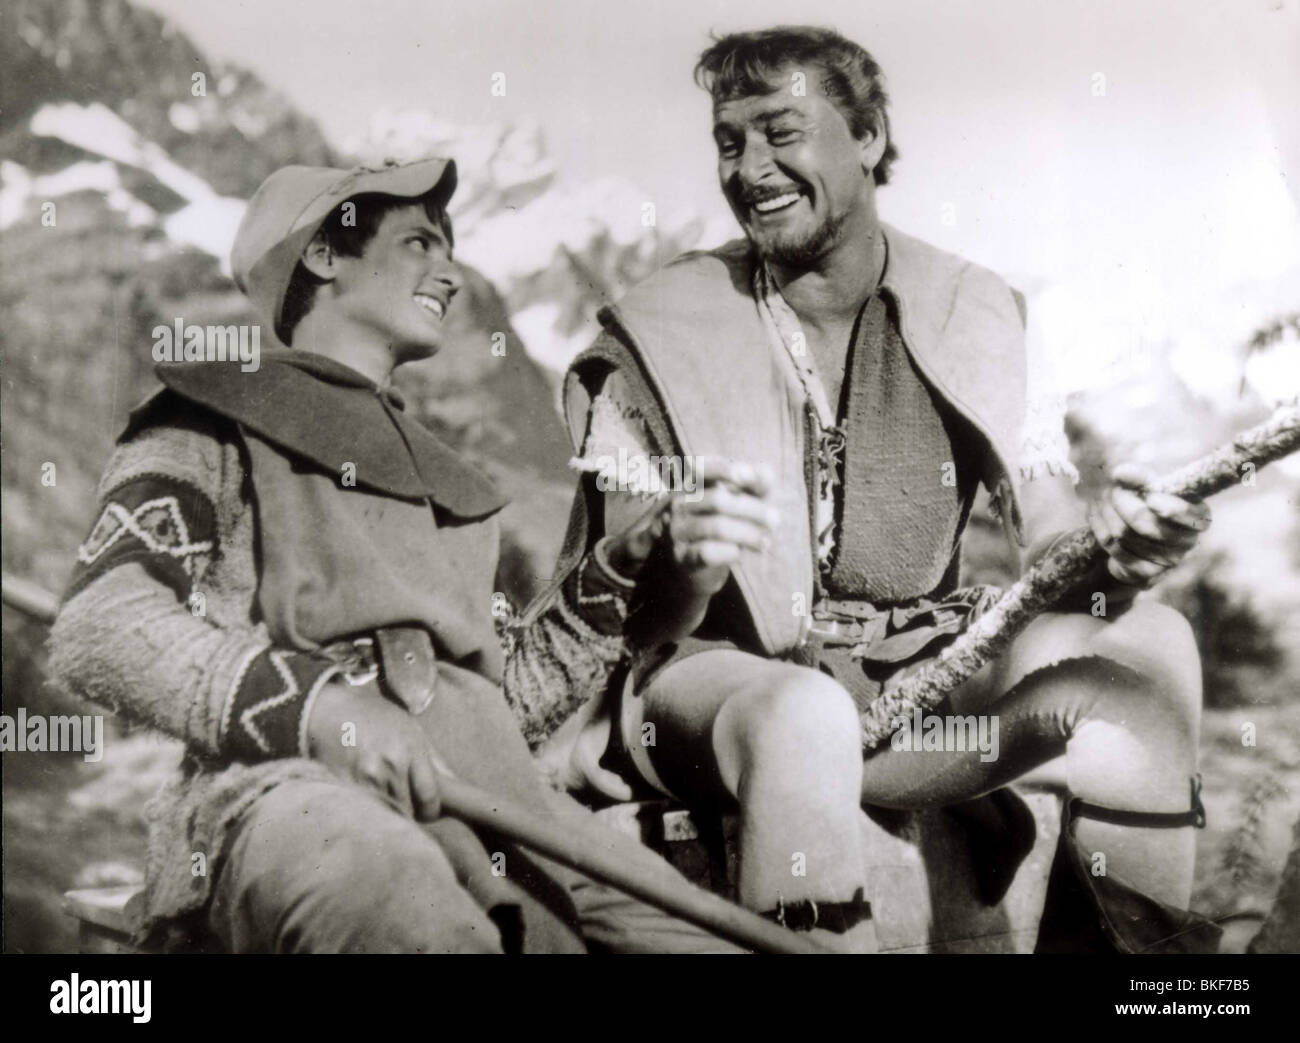 william-tell-unreleased-1953-guido-martu